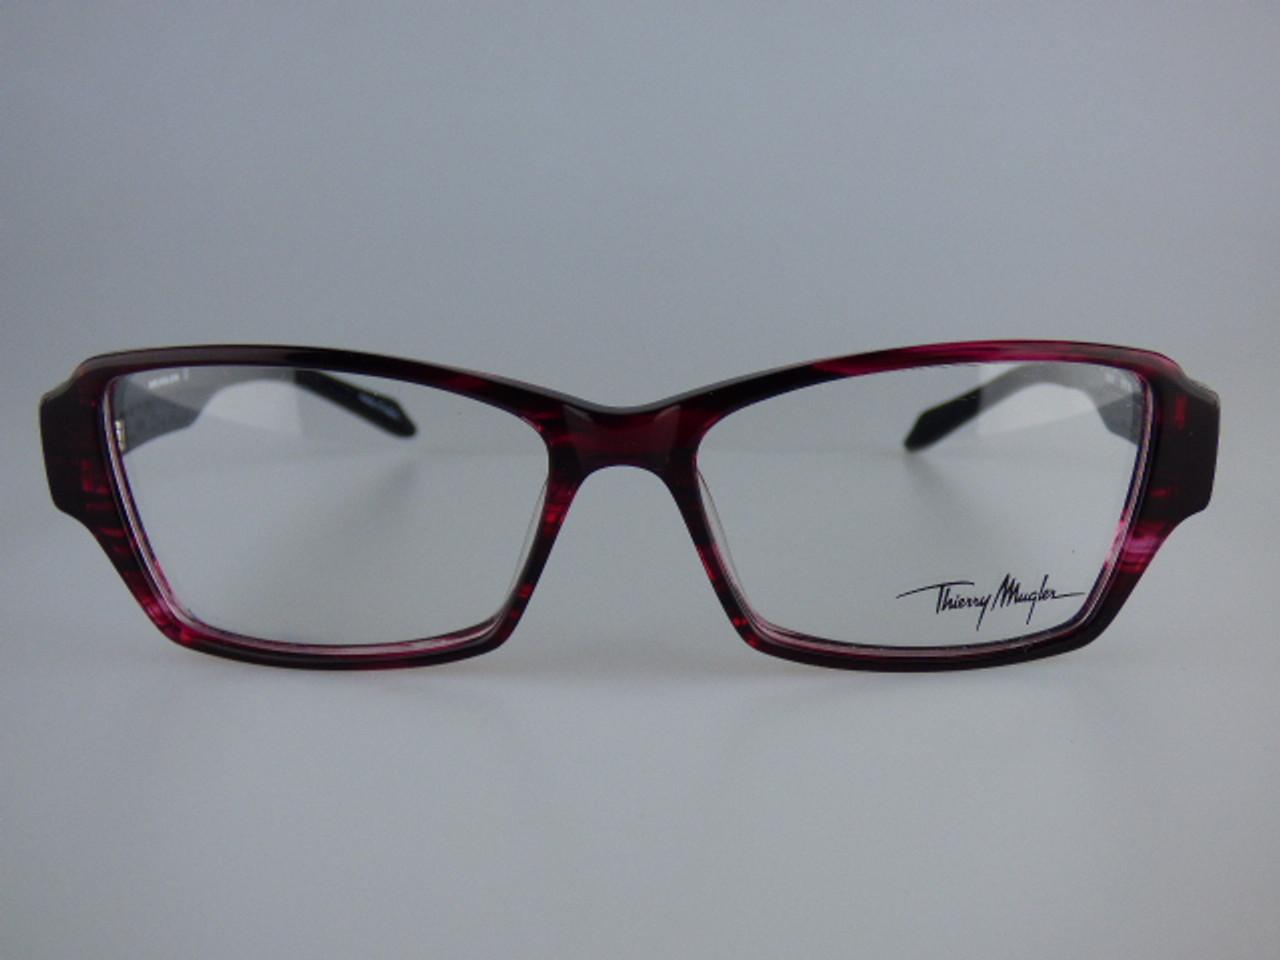 36c17c903e46 Thierry Mugler Eyeglasses model TM 9349 - Eyeglassframes4less.com